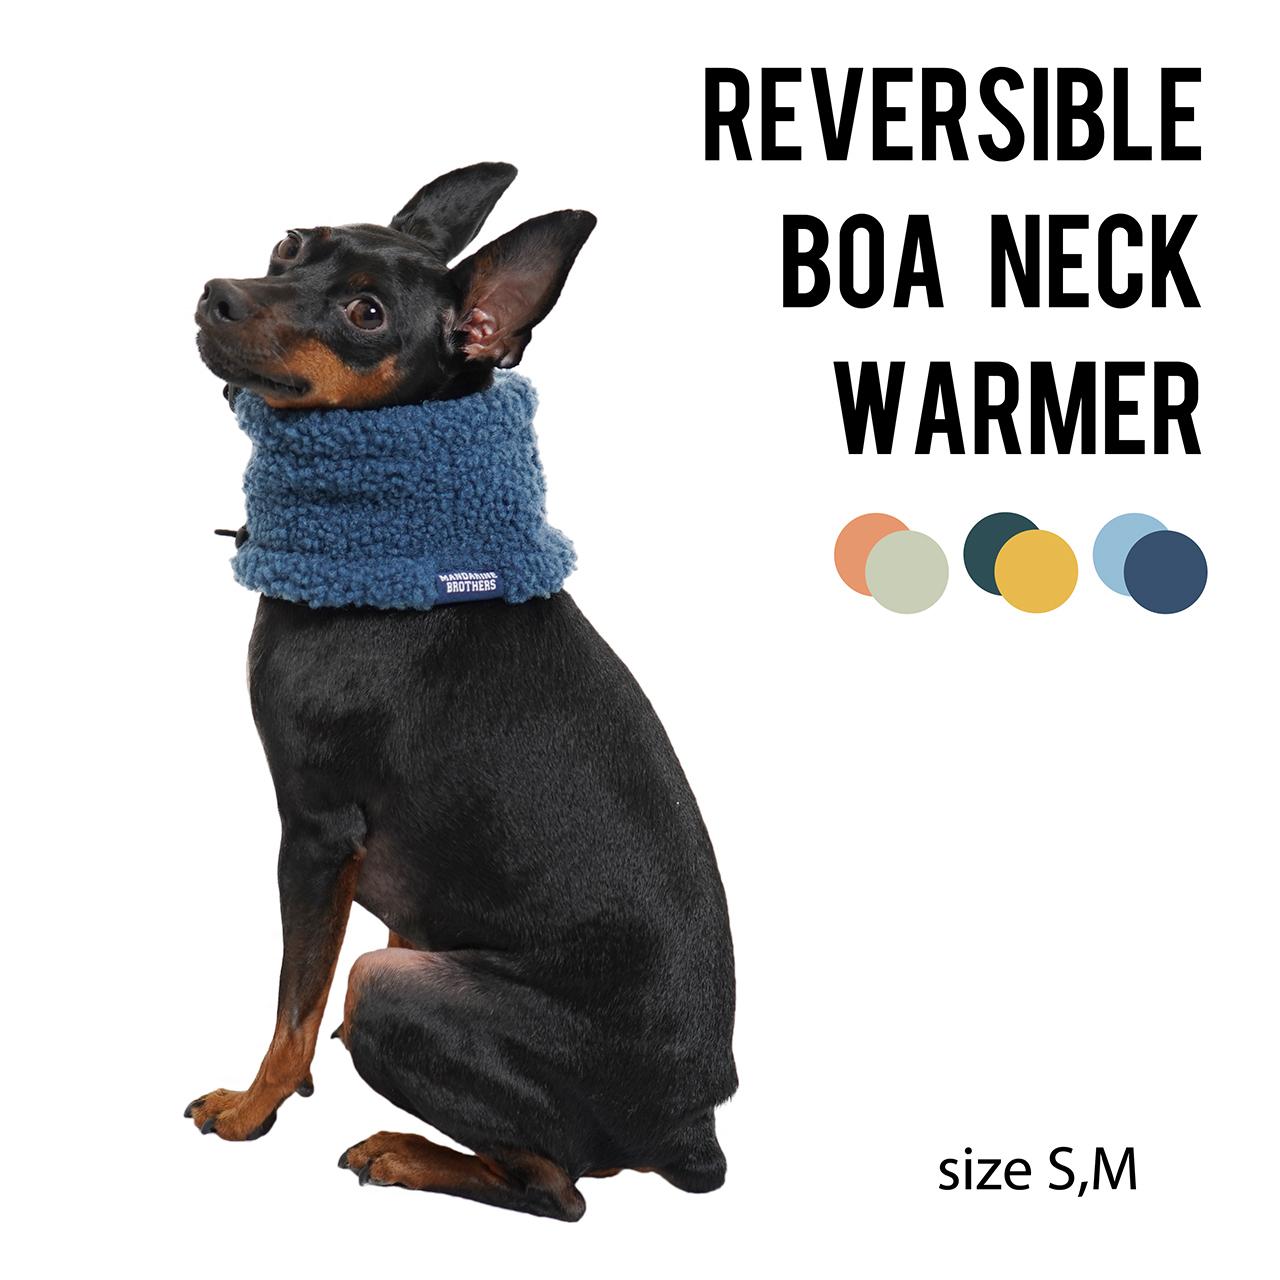 REVERSIBLE BOA NECK WARMER(S,M)リバーシブルボアネックウォーマー